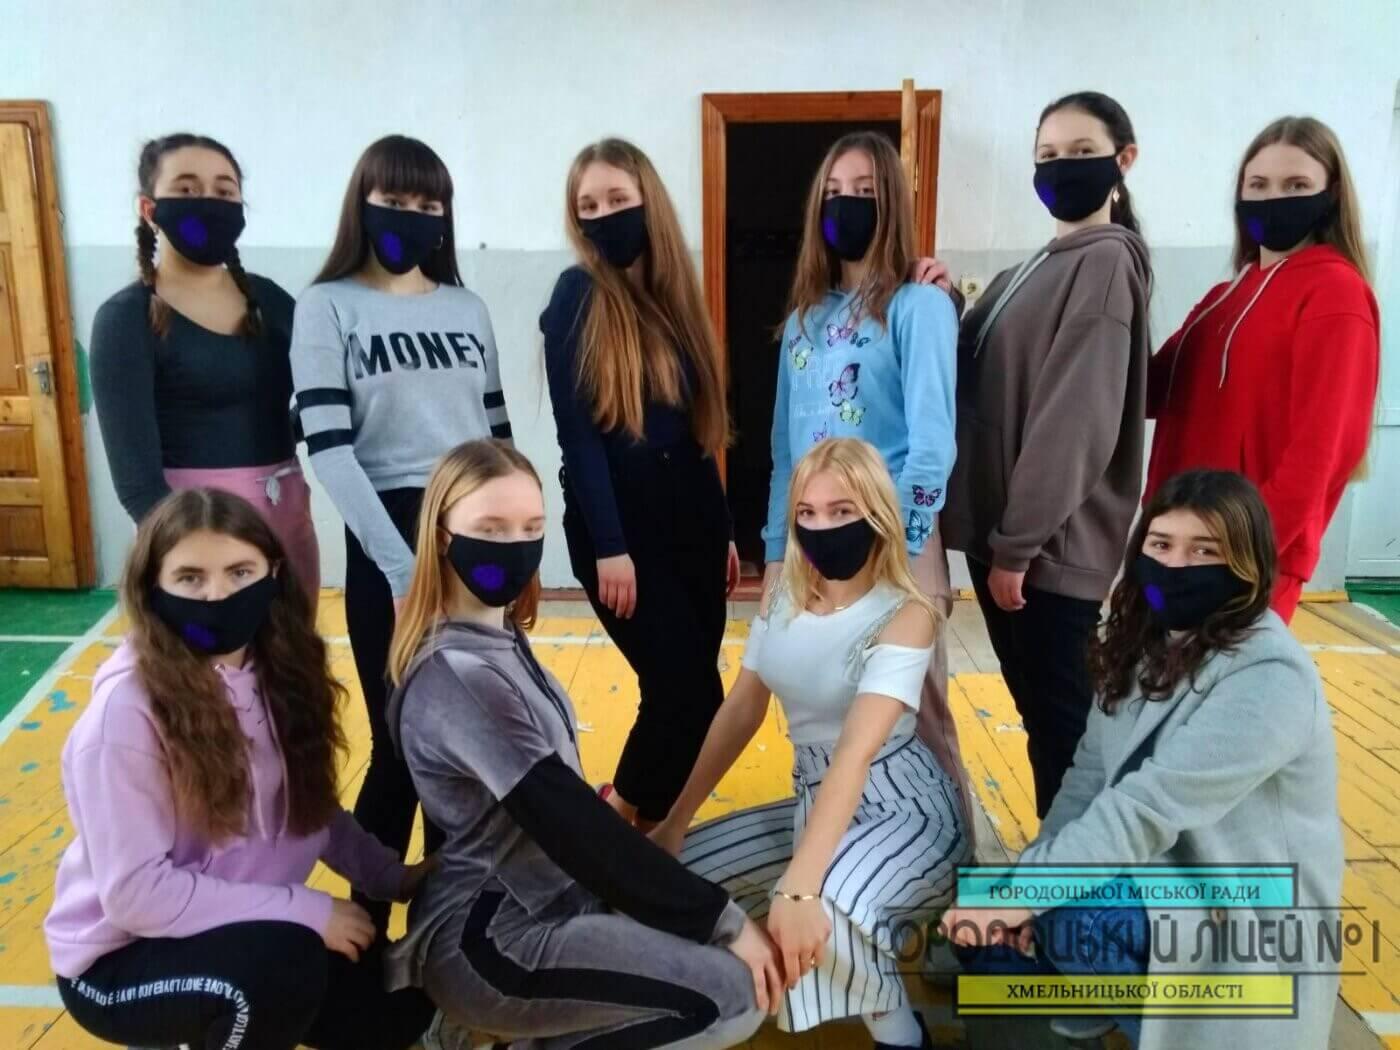 zobrazhennya viber 2021 03 03 10 51 18 1400x1050 - Нумо, дівчата!